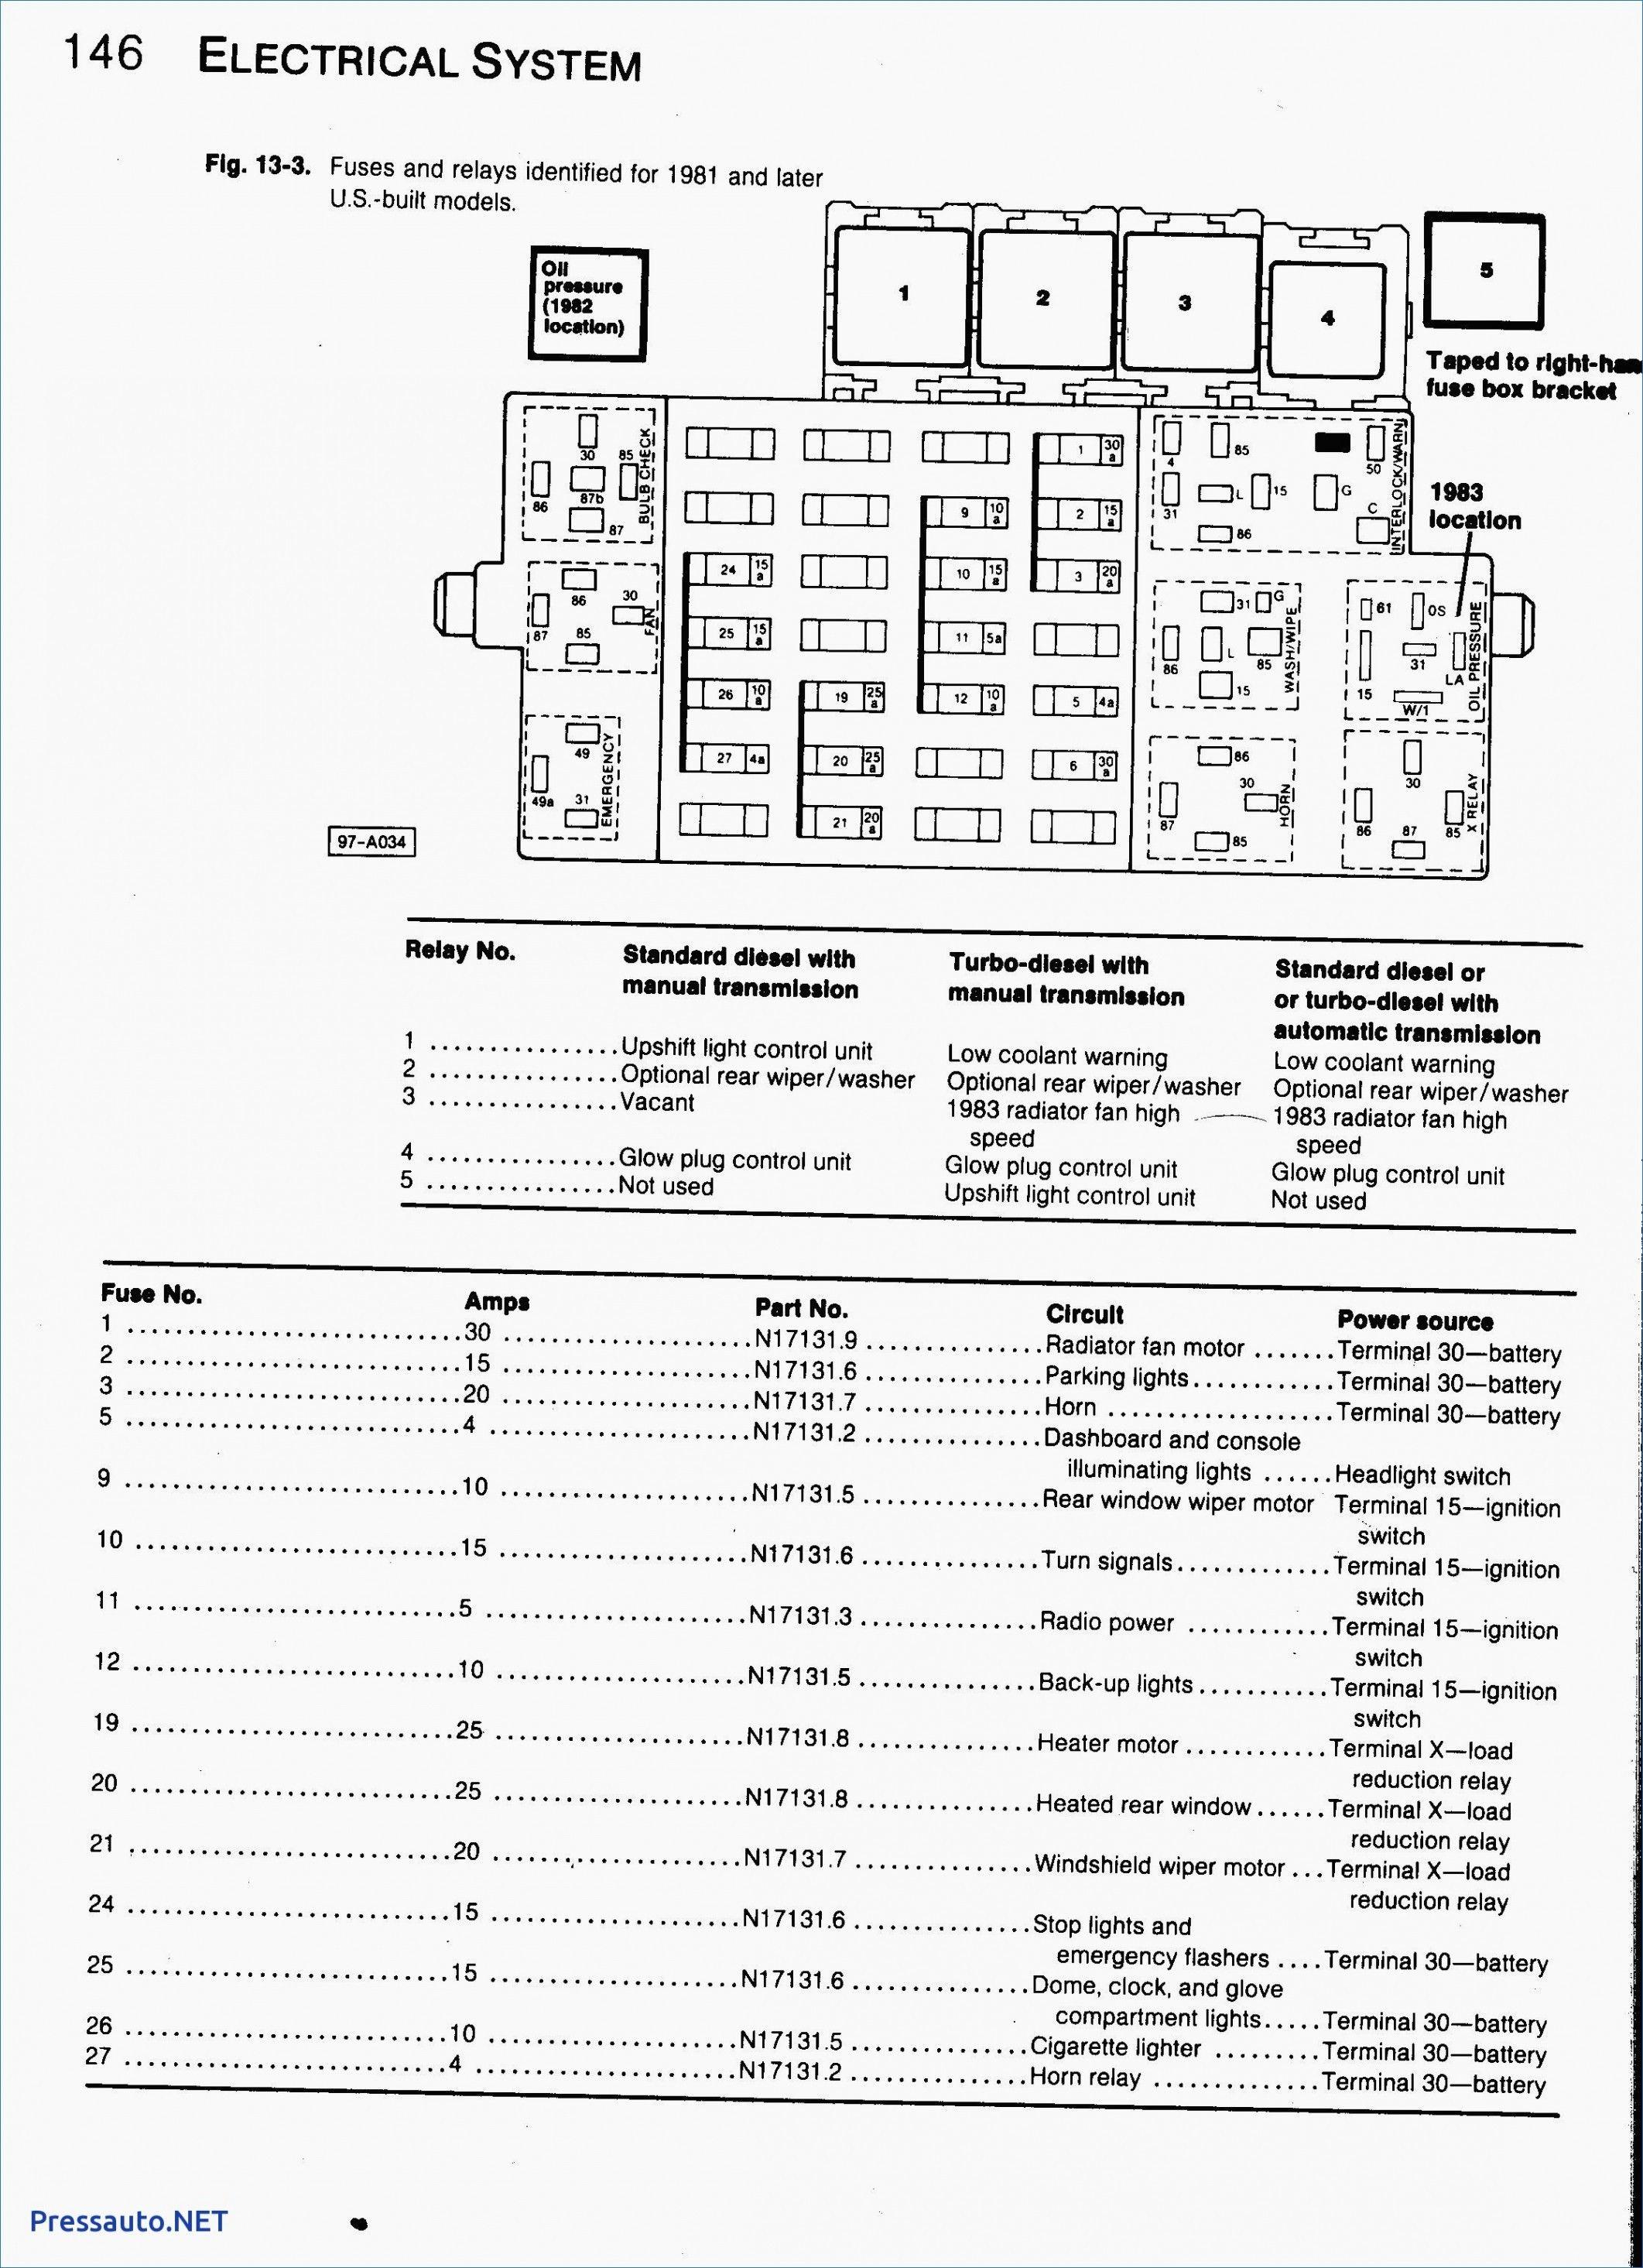 Audi A4 V6 Wiring Diagram Noticias Arquitectura Londres Buenos Aires